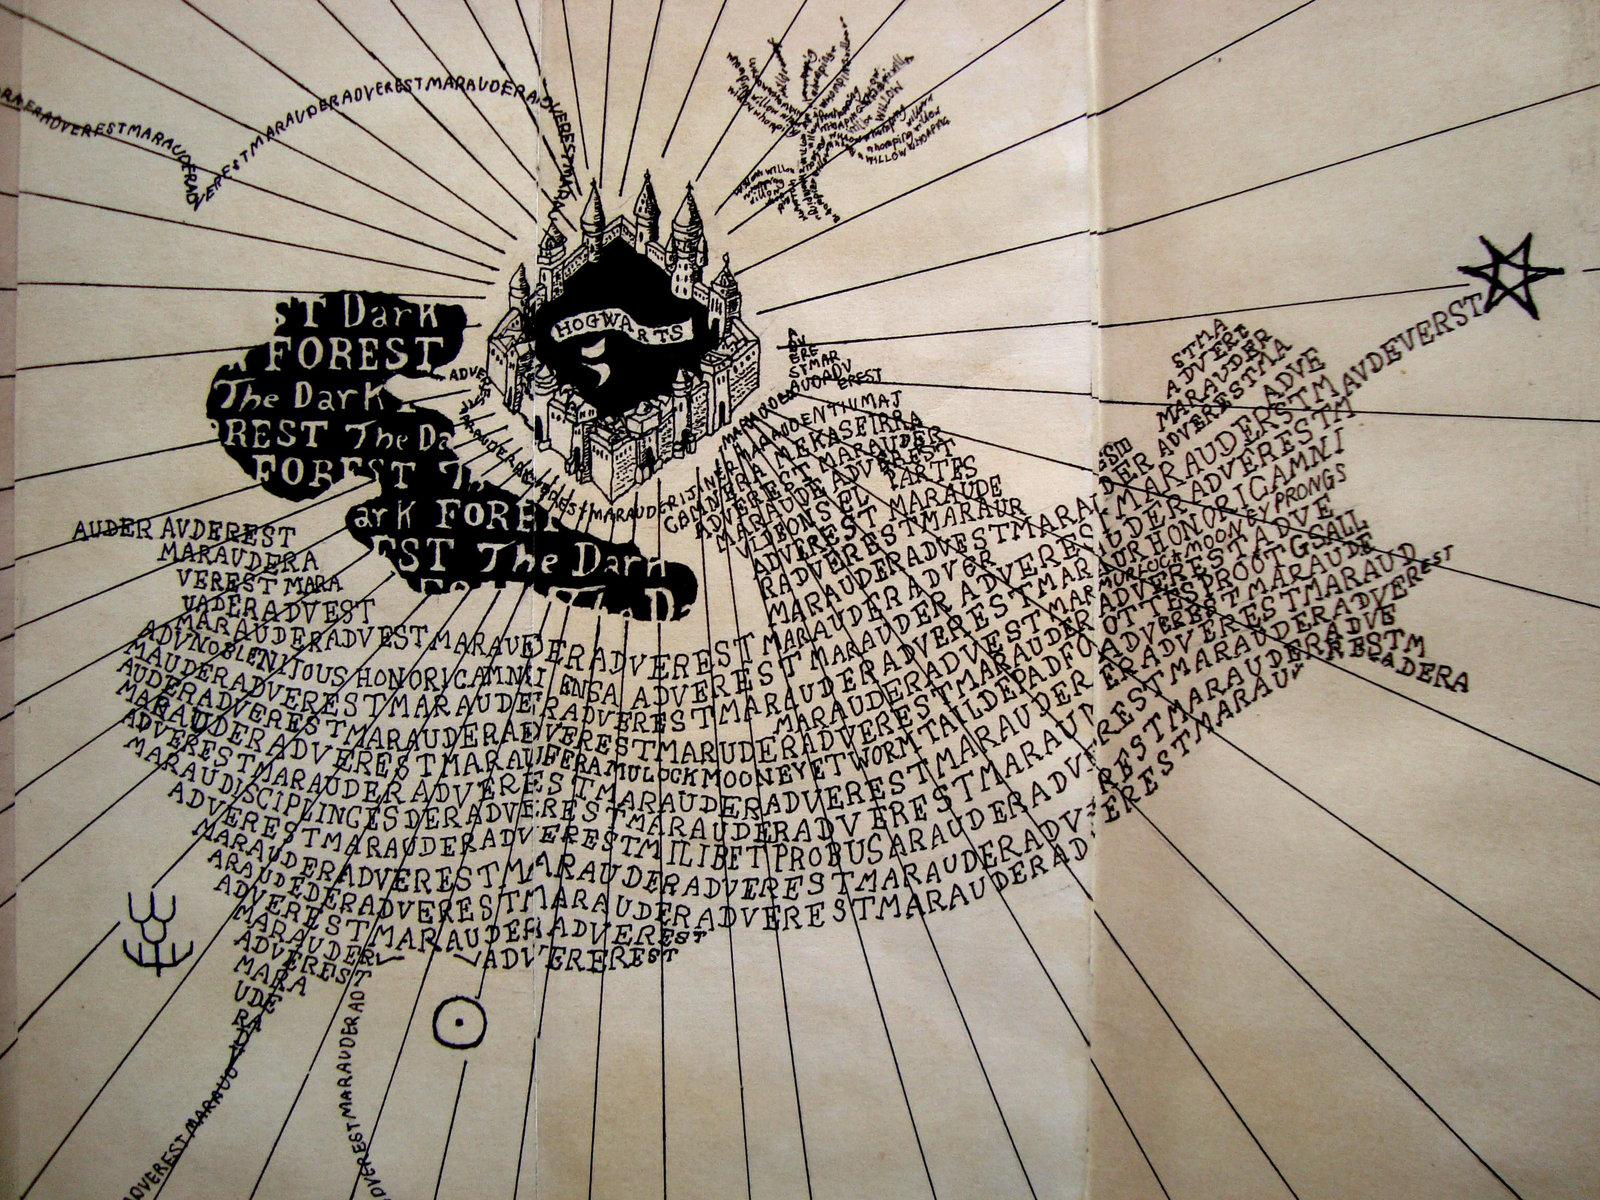 Harry Potters Marauders Map By Ilovechez On Deviantart 1600x1200